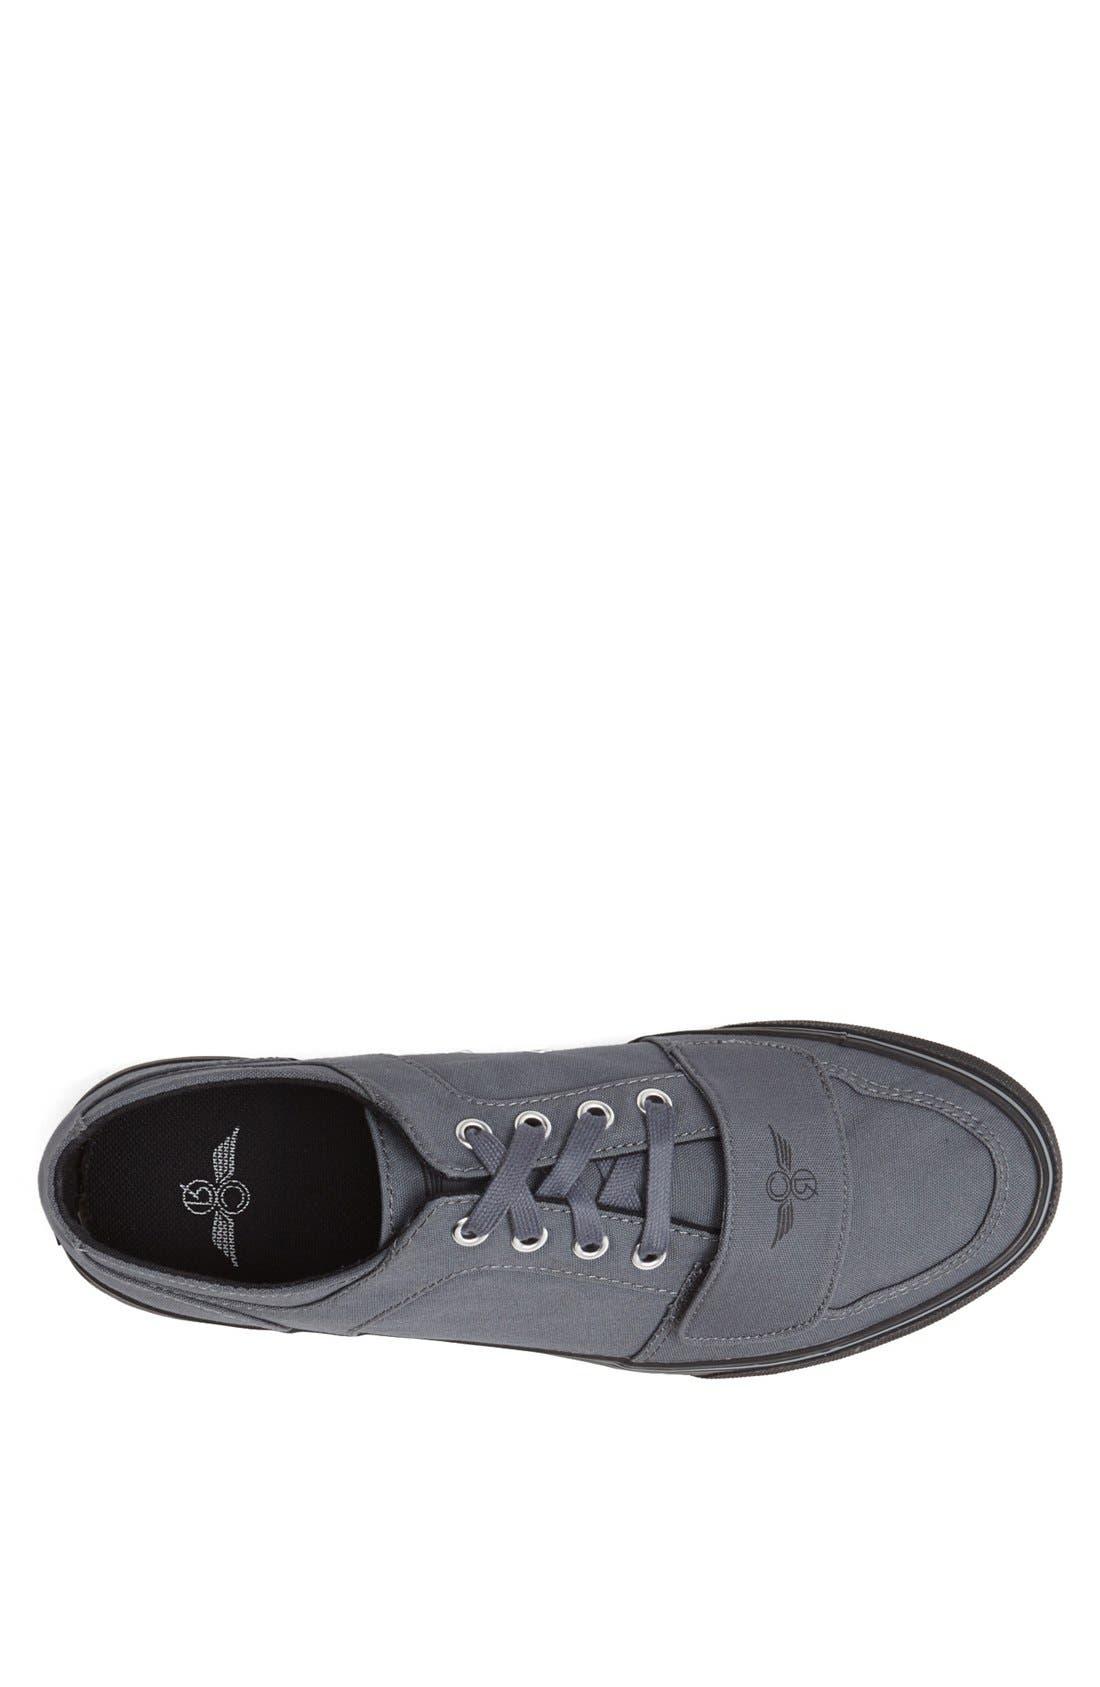 Alternate Image 3  - Creative Recreation 'Cesario Lo XVI' Sneaker